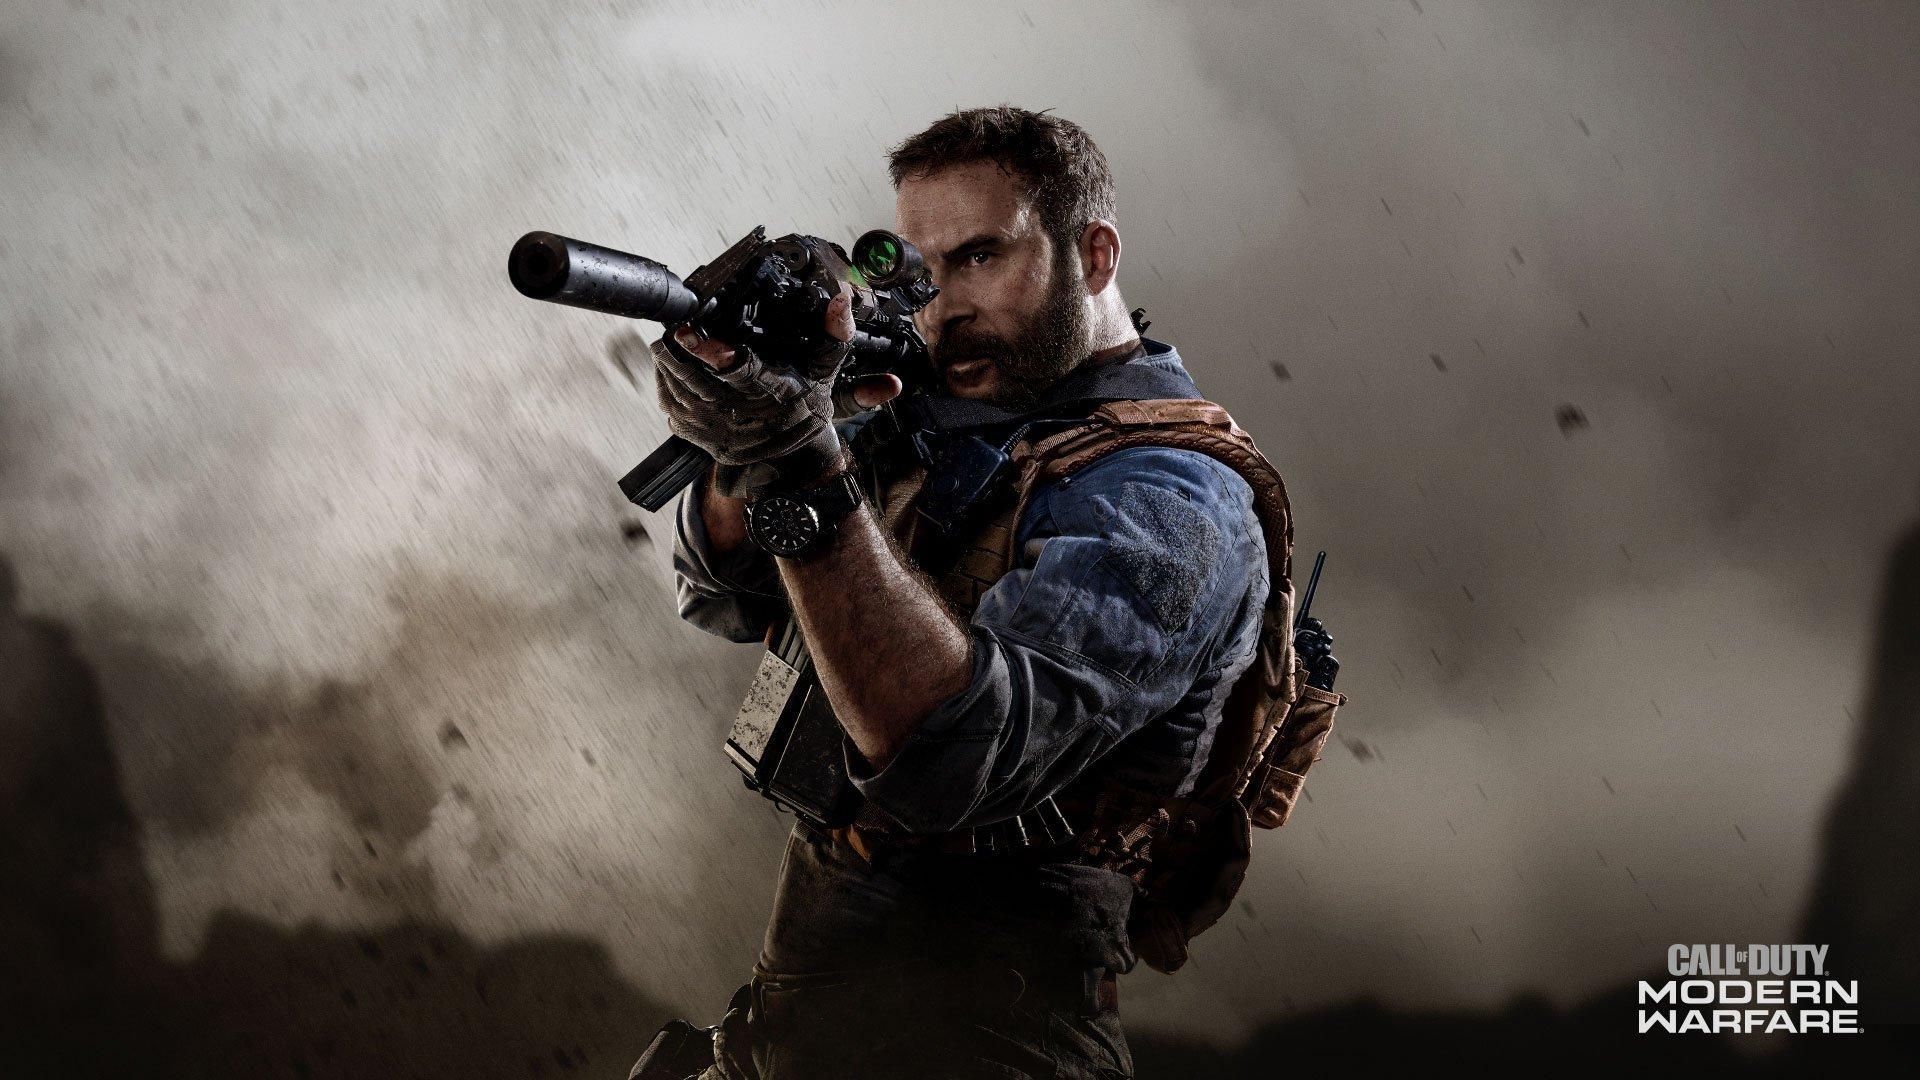 Call of Duty Modern Warfare oynanış videosu